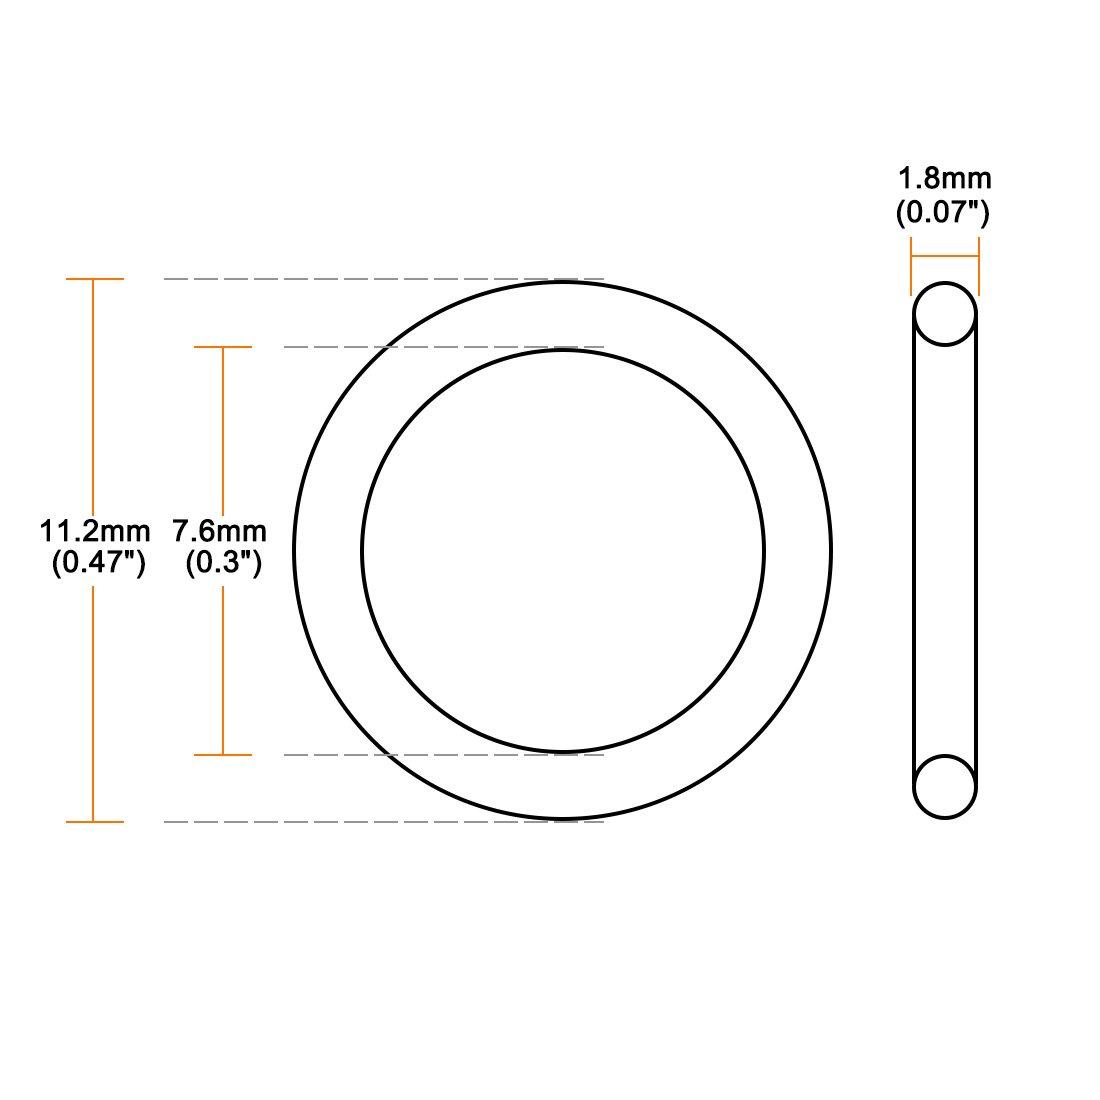 Sourcing Map O-Ring Nitrile Gomma 7.6mm x 11.2mm x 1.8mm Guarnizioni Anelli Di Tenuta 20pz